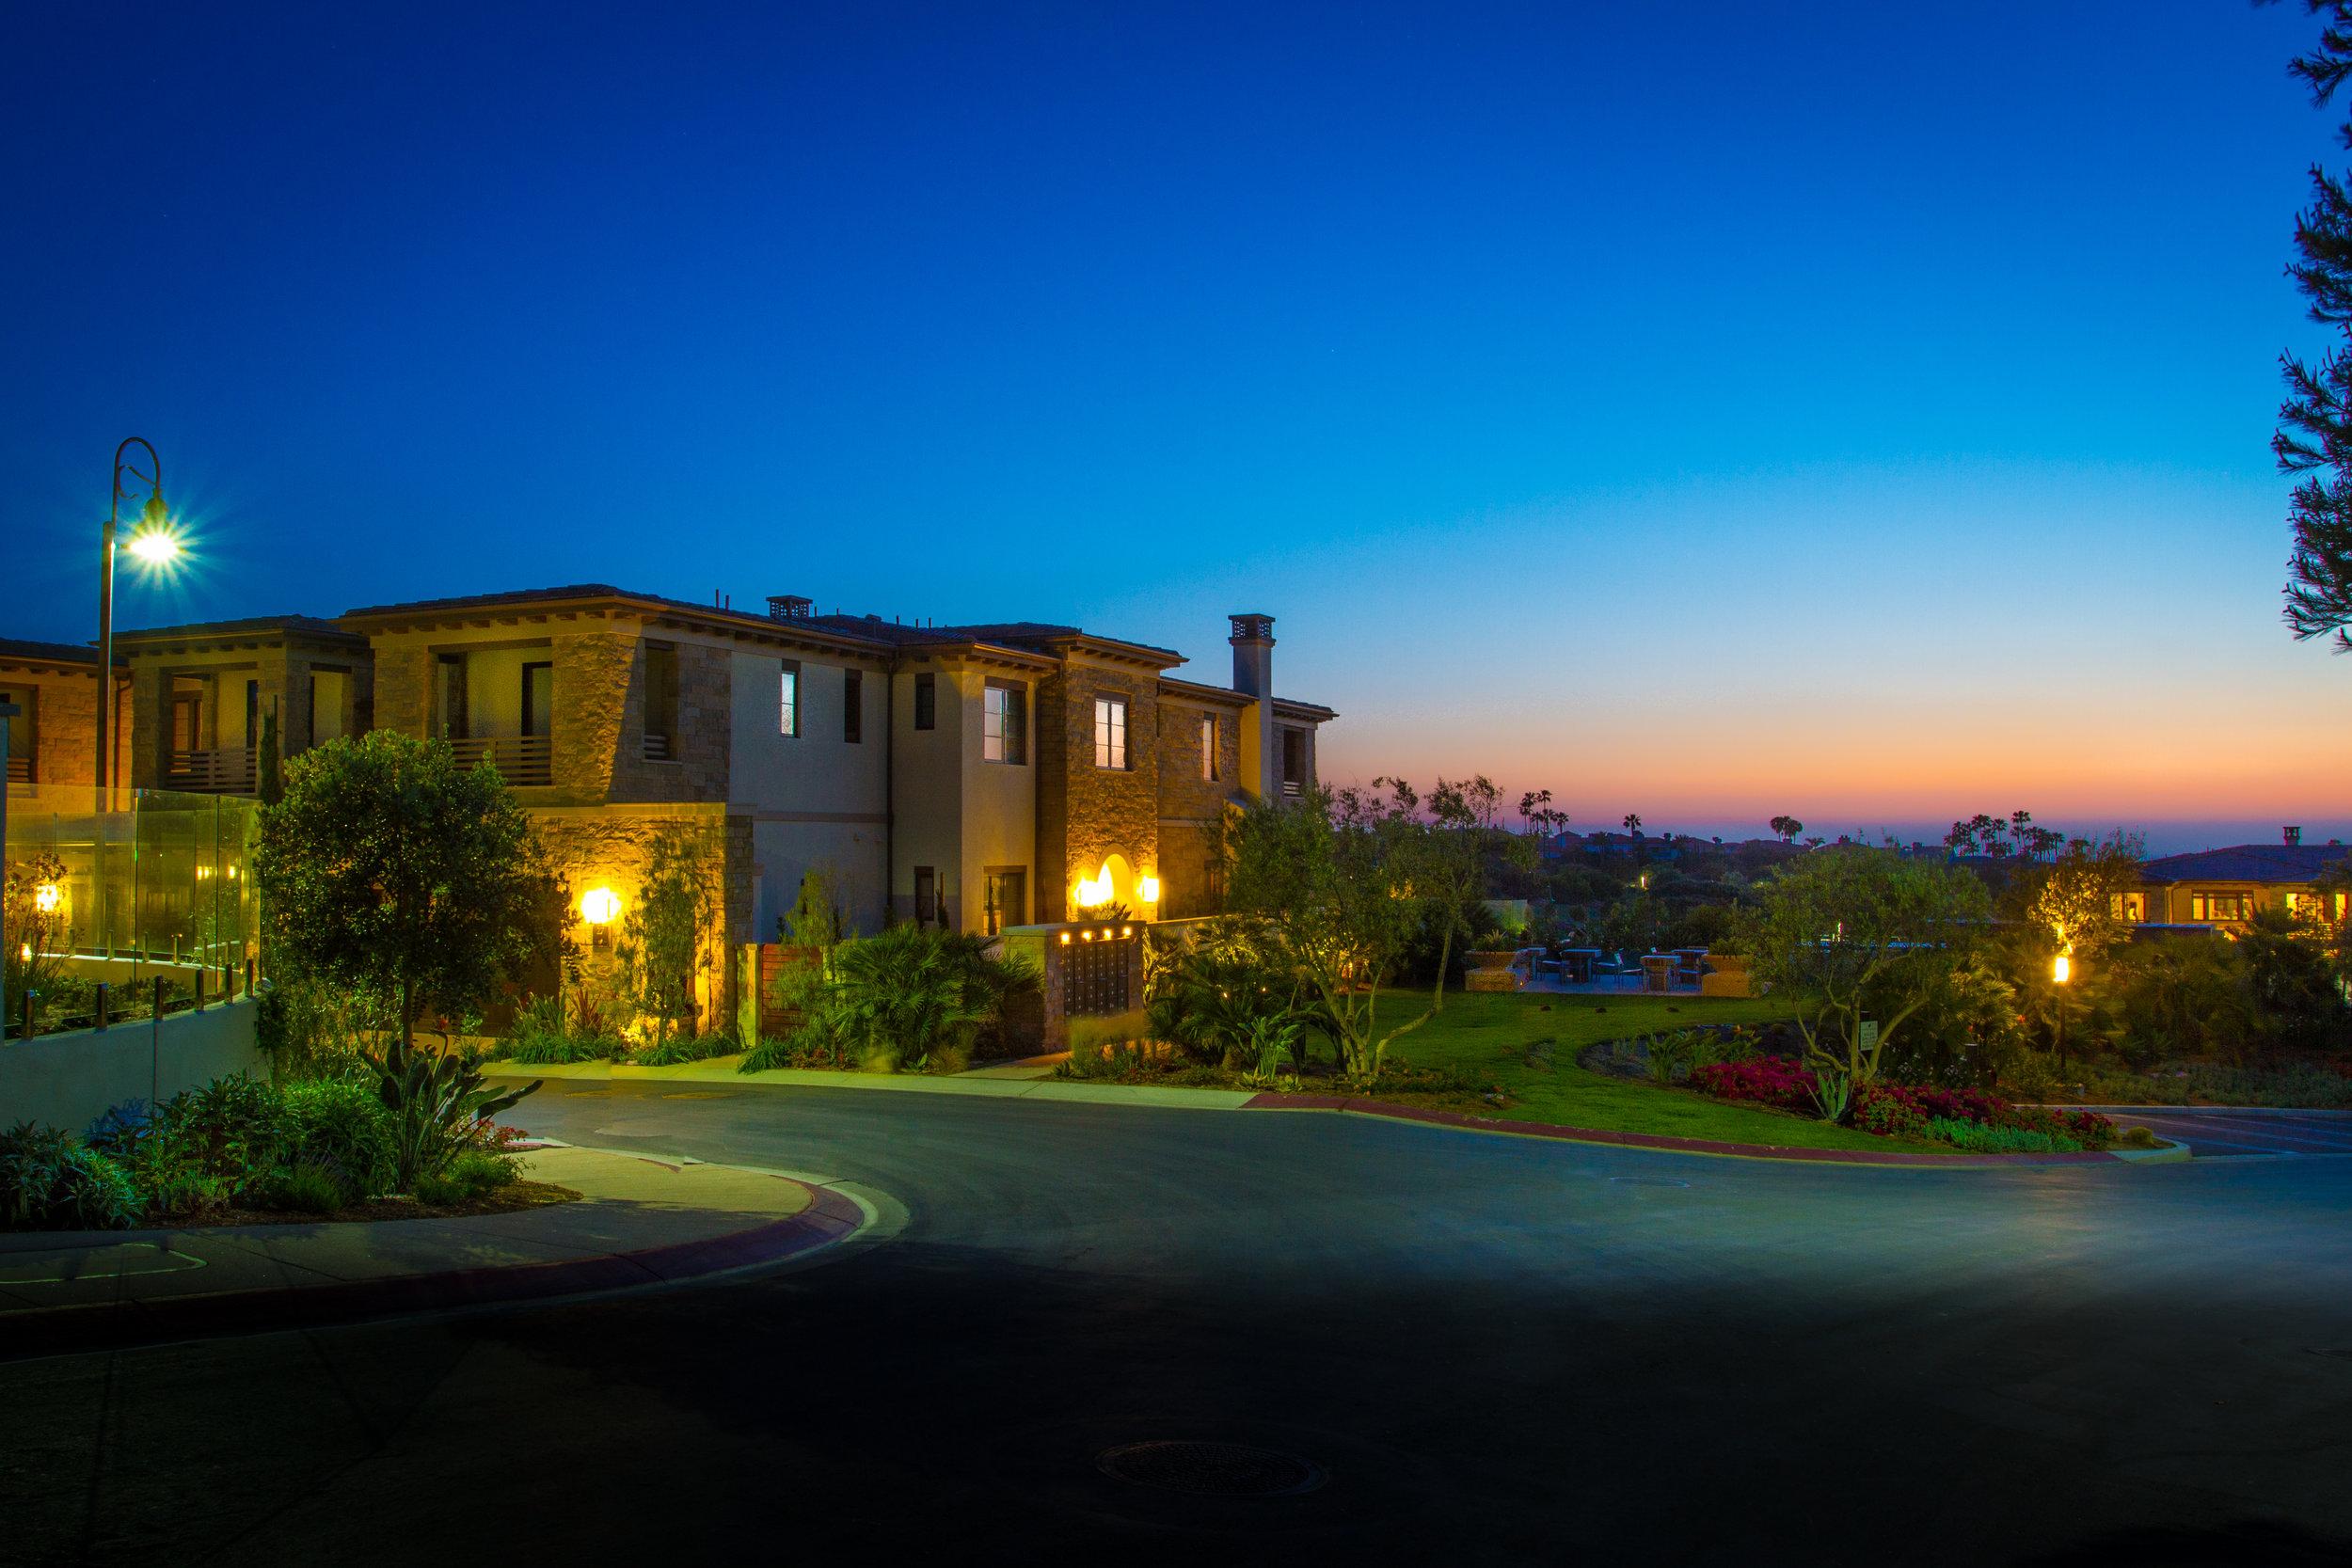 Lighting Maintenance Orange County | Lighting Maintenance San Diego | Lighting Maintenance Inland Empire | Lighting Maintenance Palm Desert | Lighting Maintenance San Francisco